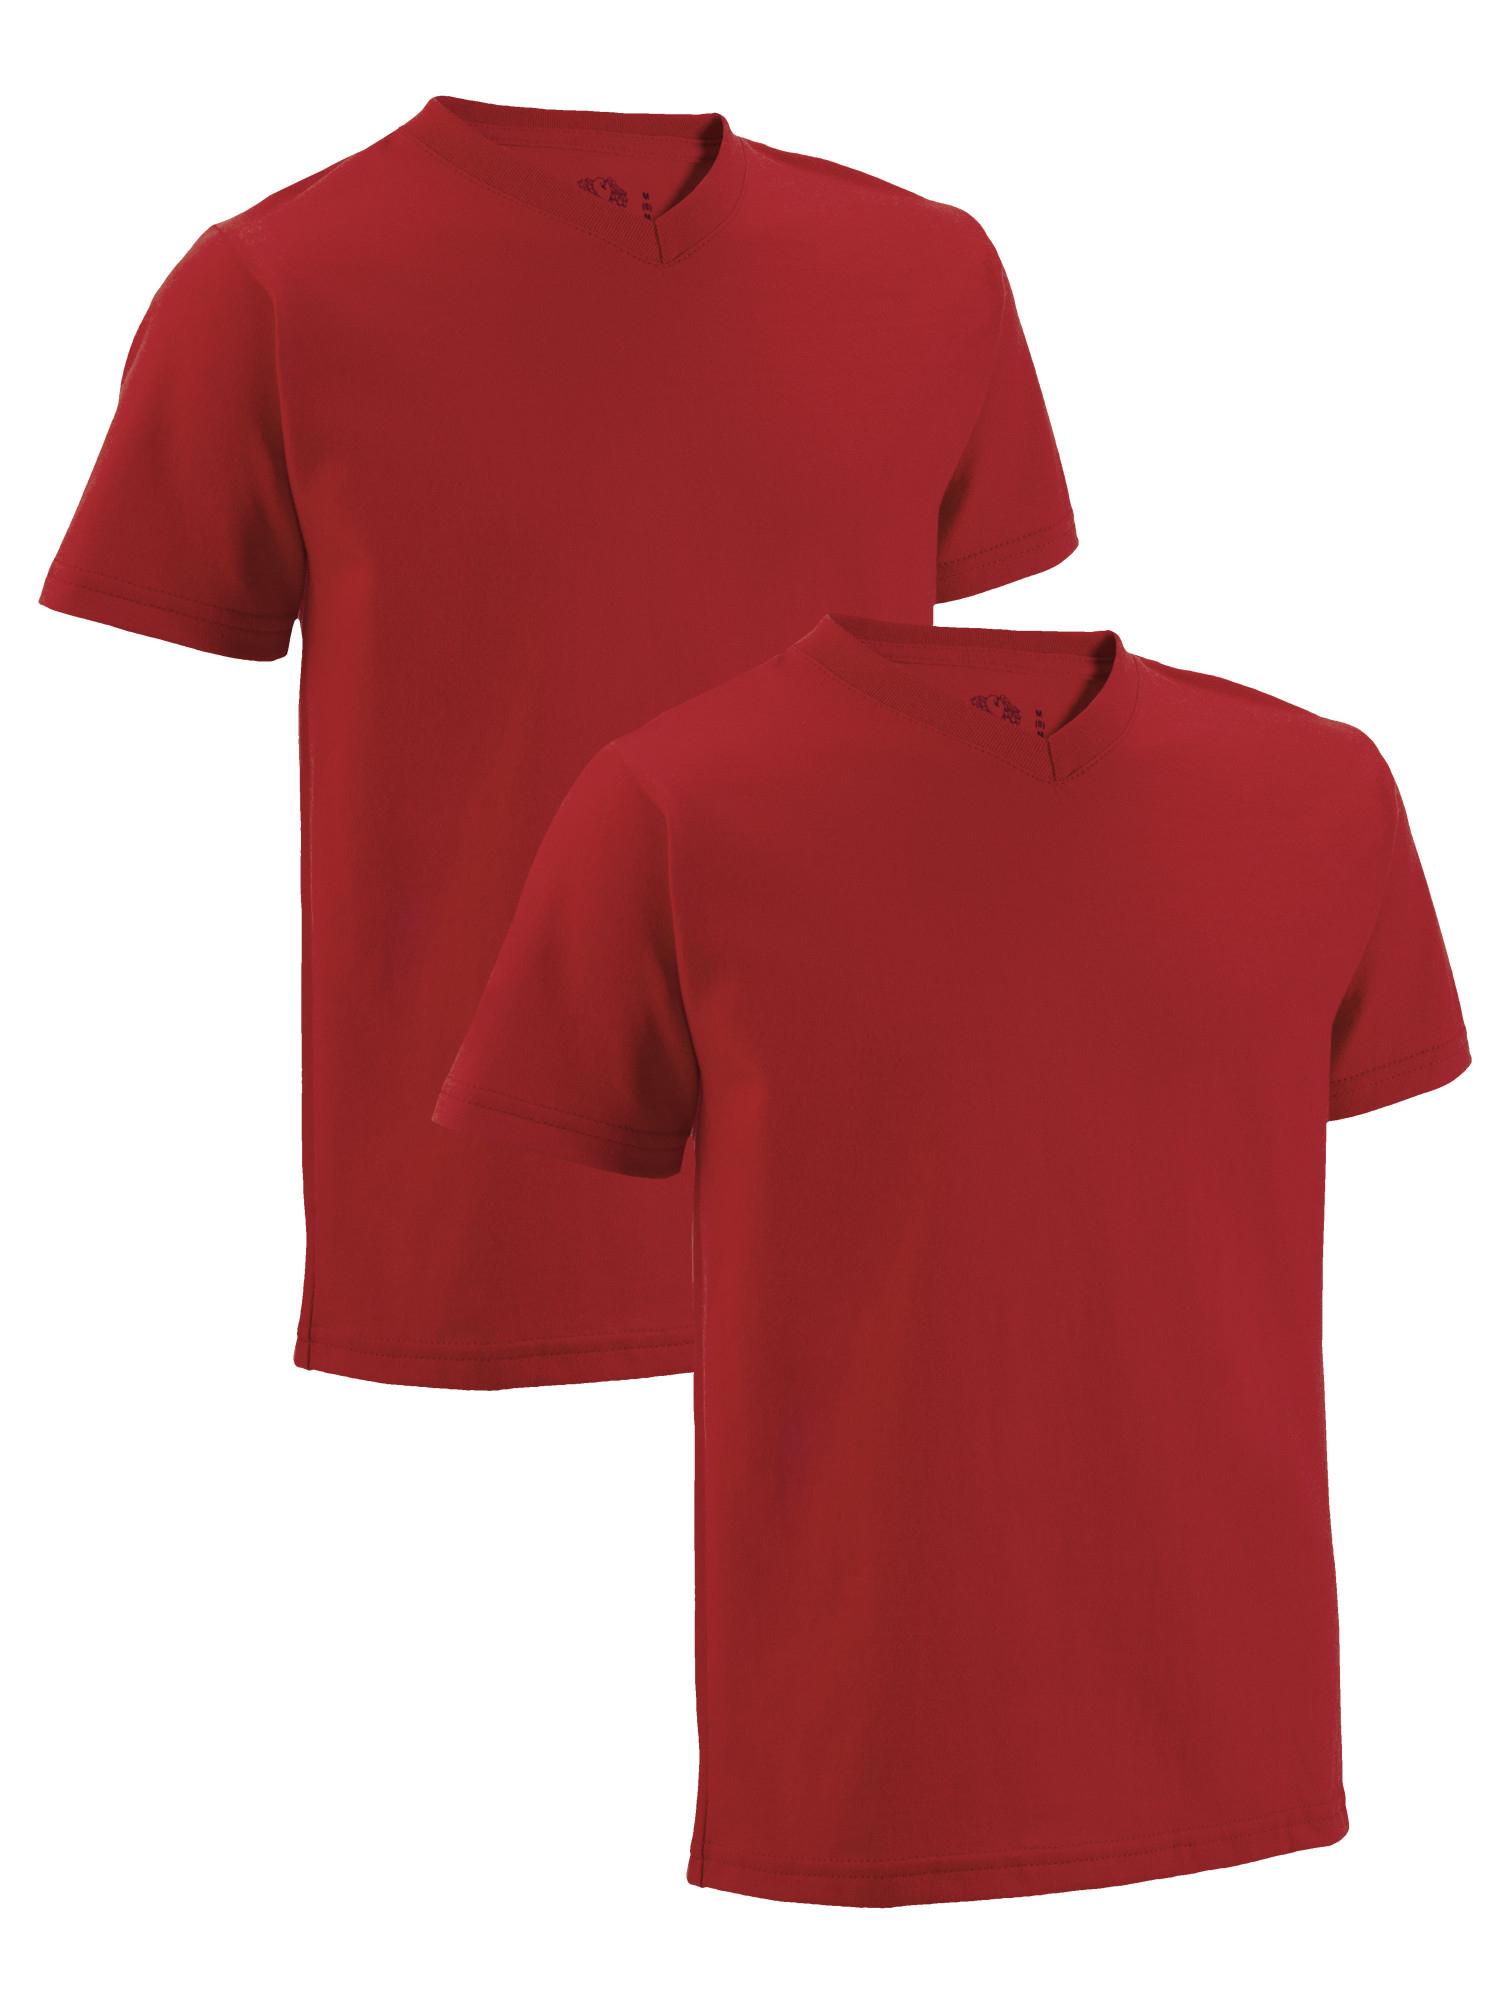 Fruit of the Loom Boys' Short Sleeve V-Neck T-Shirts, 2 Pack